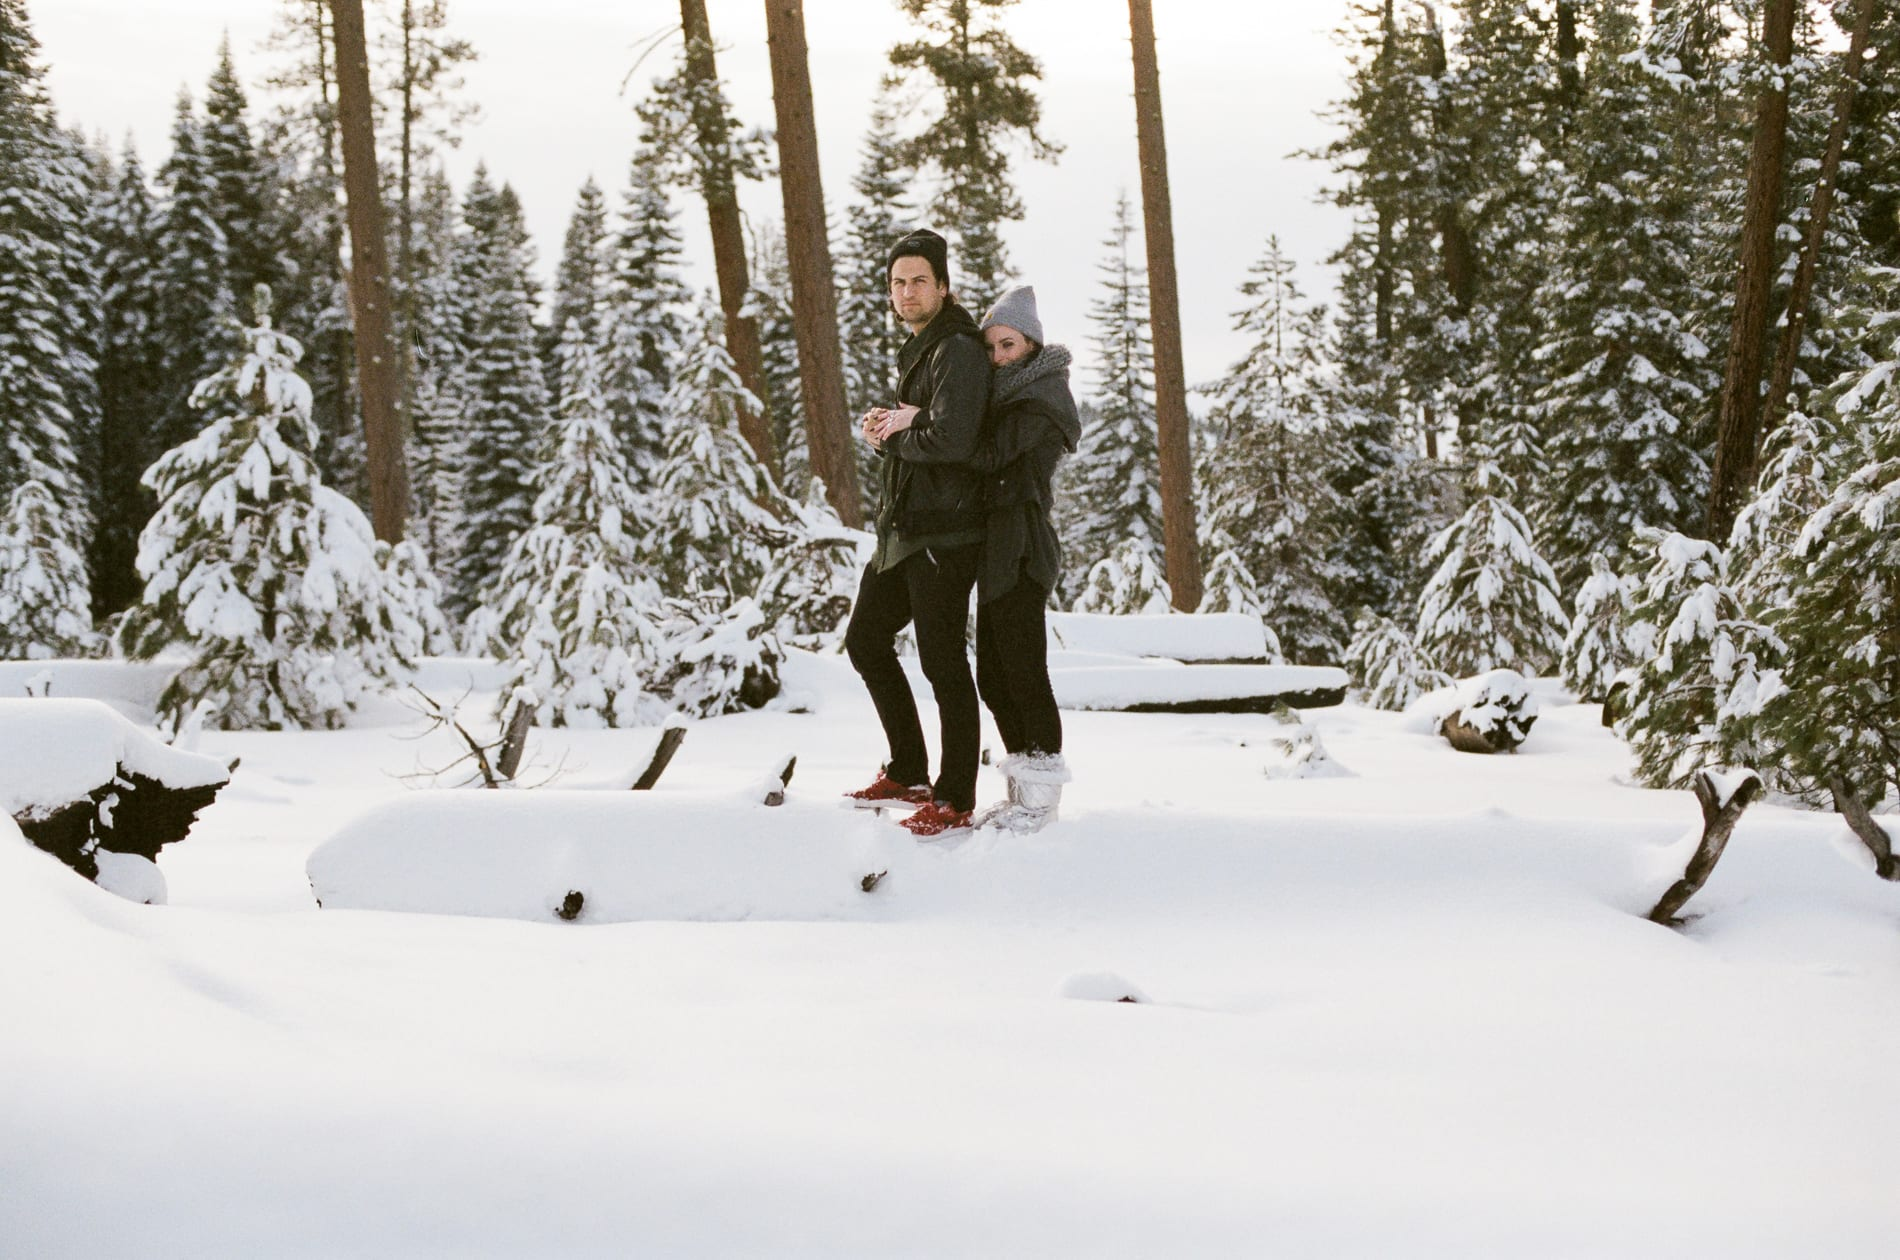 mt-lassen-winter-snow-couples-photo-9